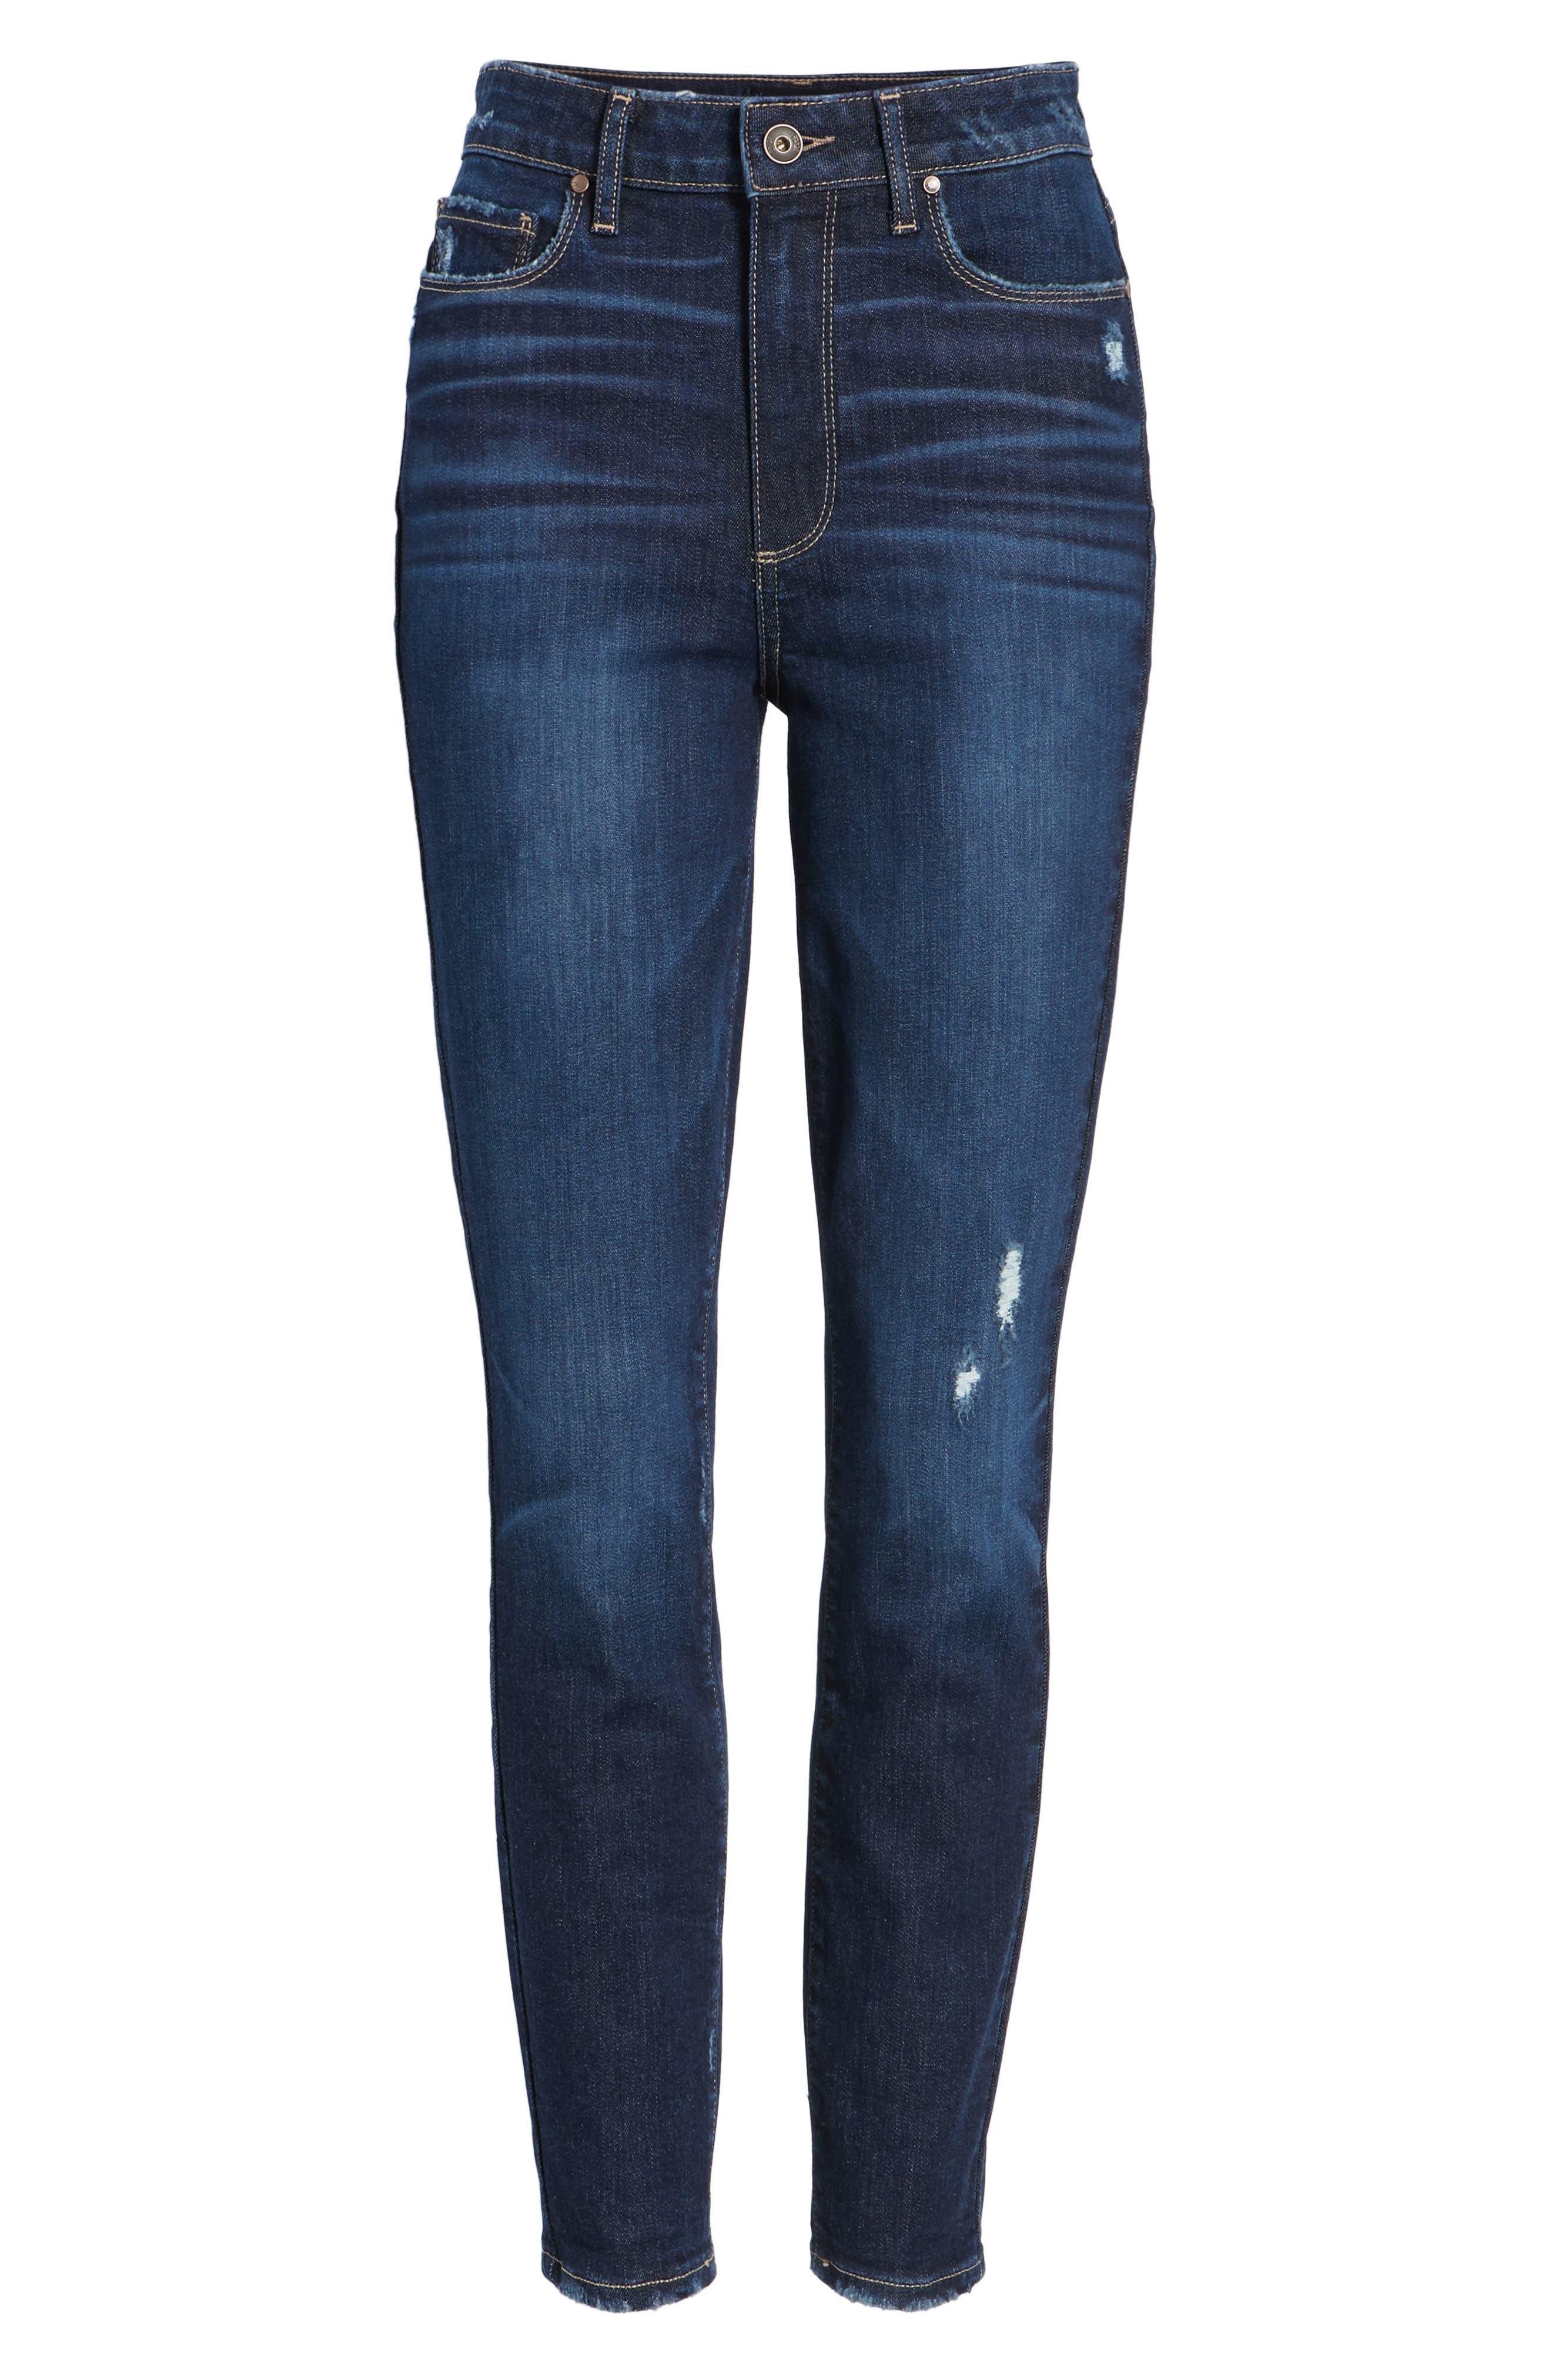 Margot High Waist Ankle Skinny Jeans,                             Alternate thumbnail 6, color,                             400